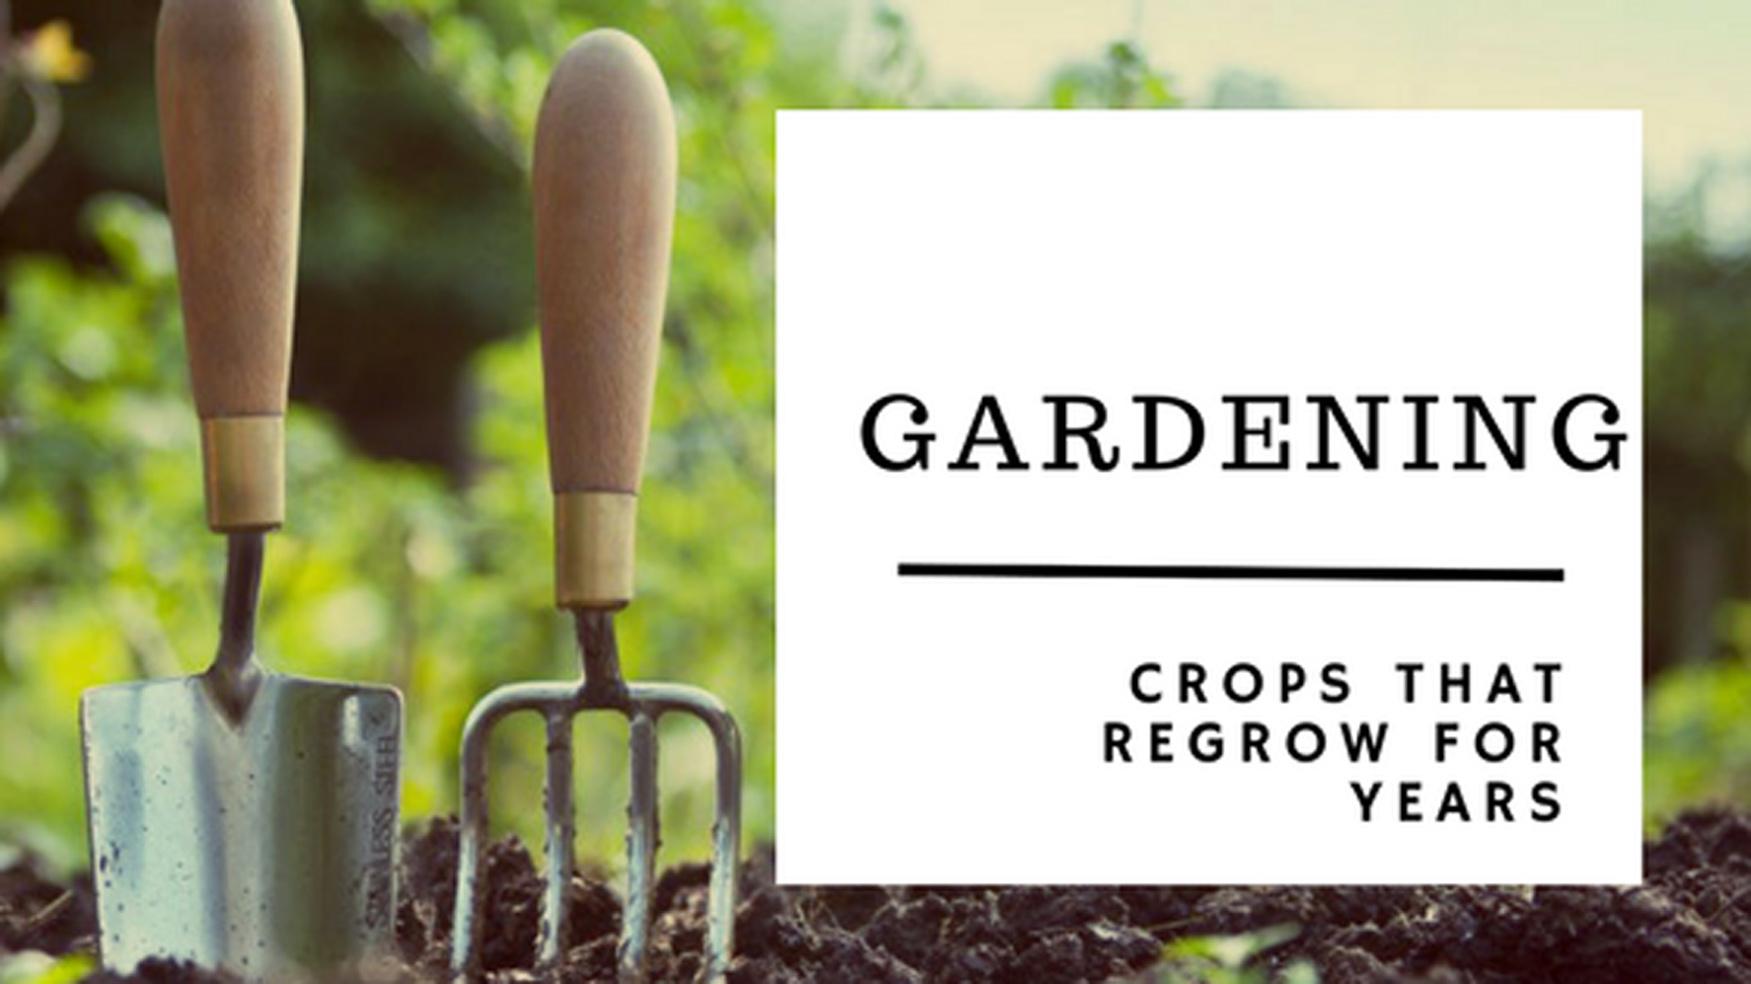 crops that regrow